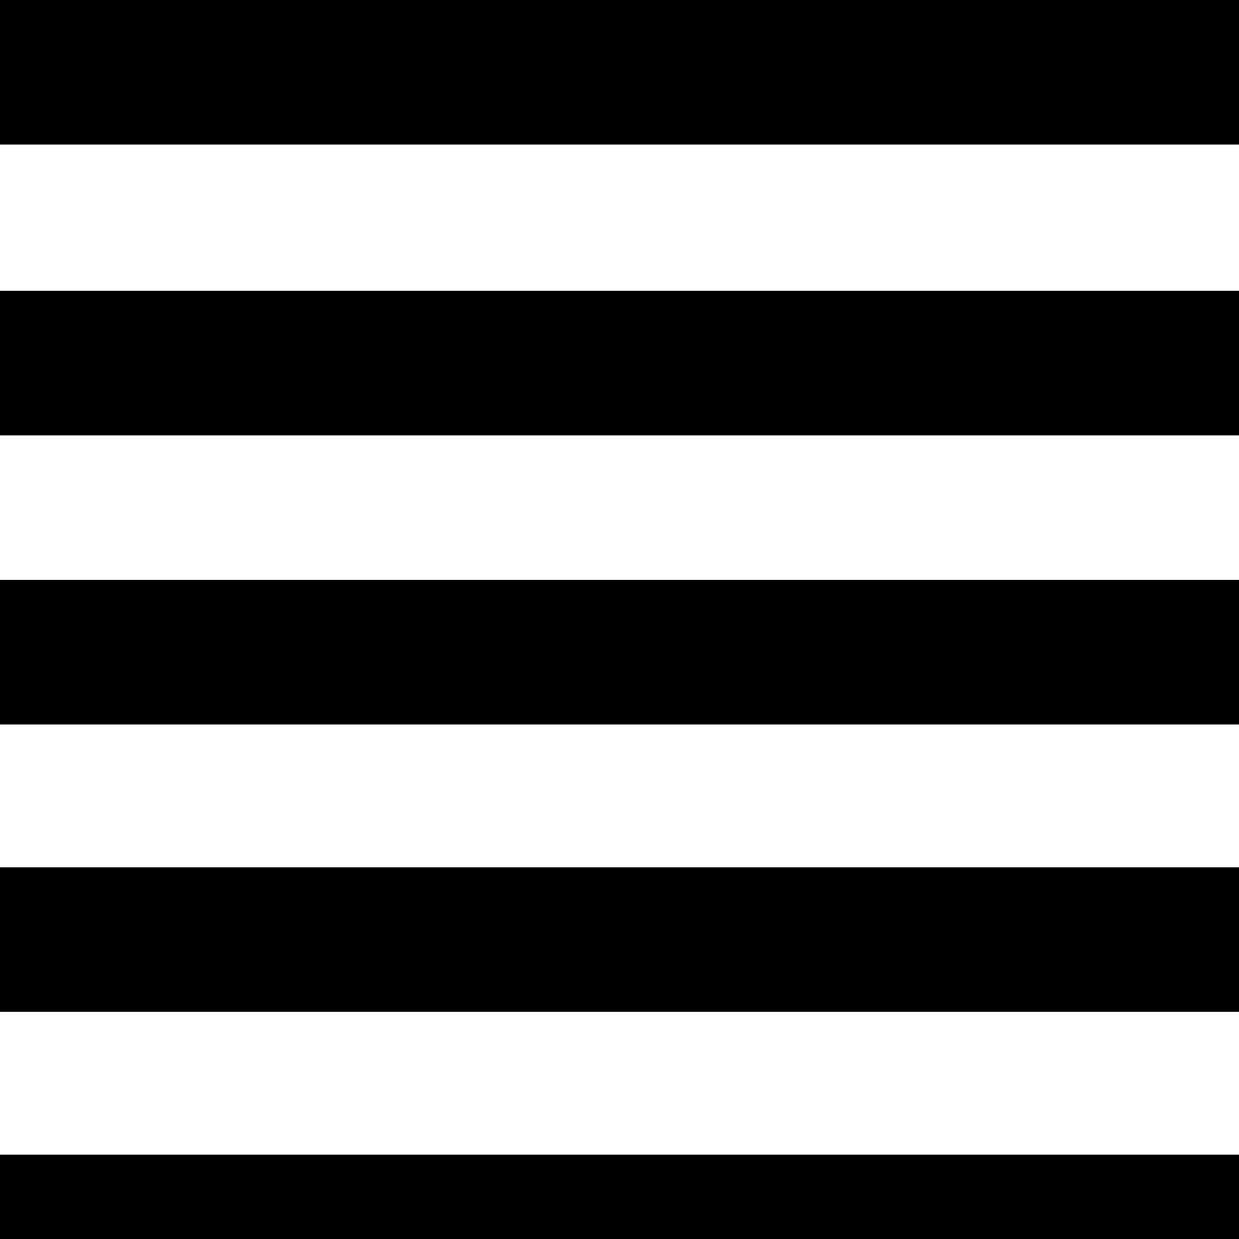 Home Backdrops Stripes Black and White Horizontal stripes 1239x1239